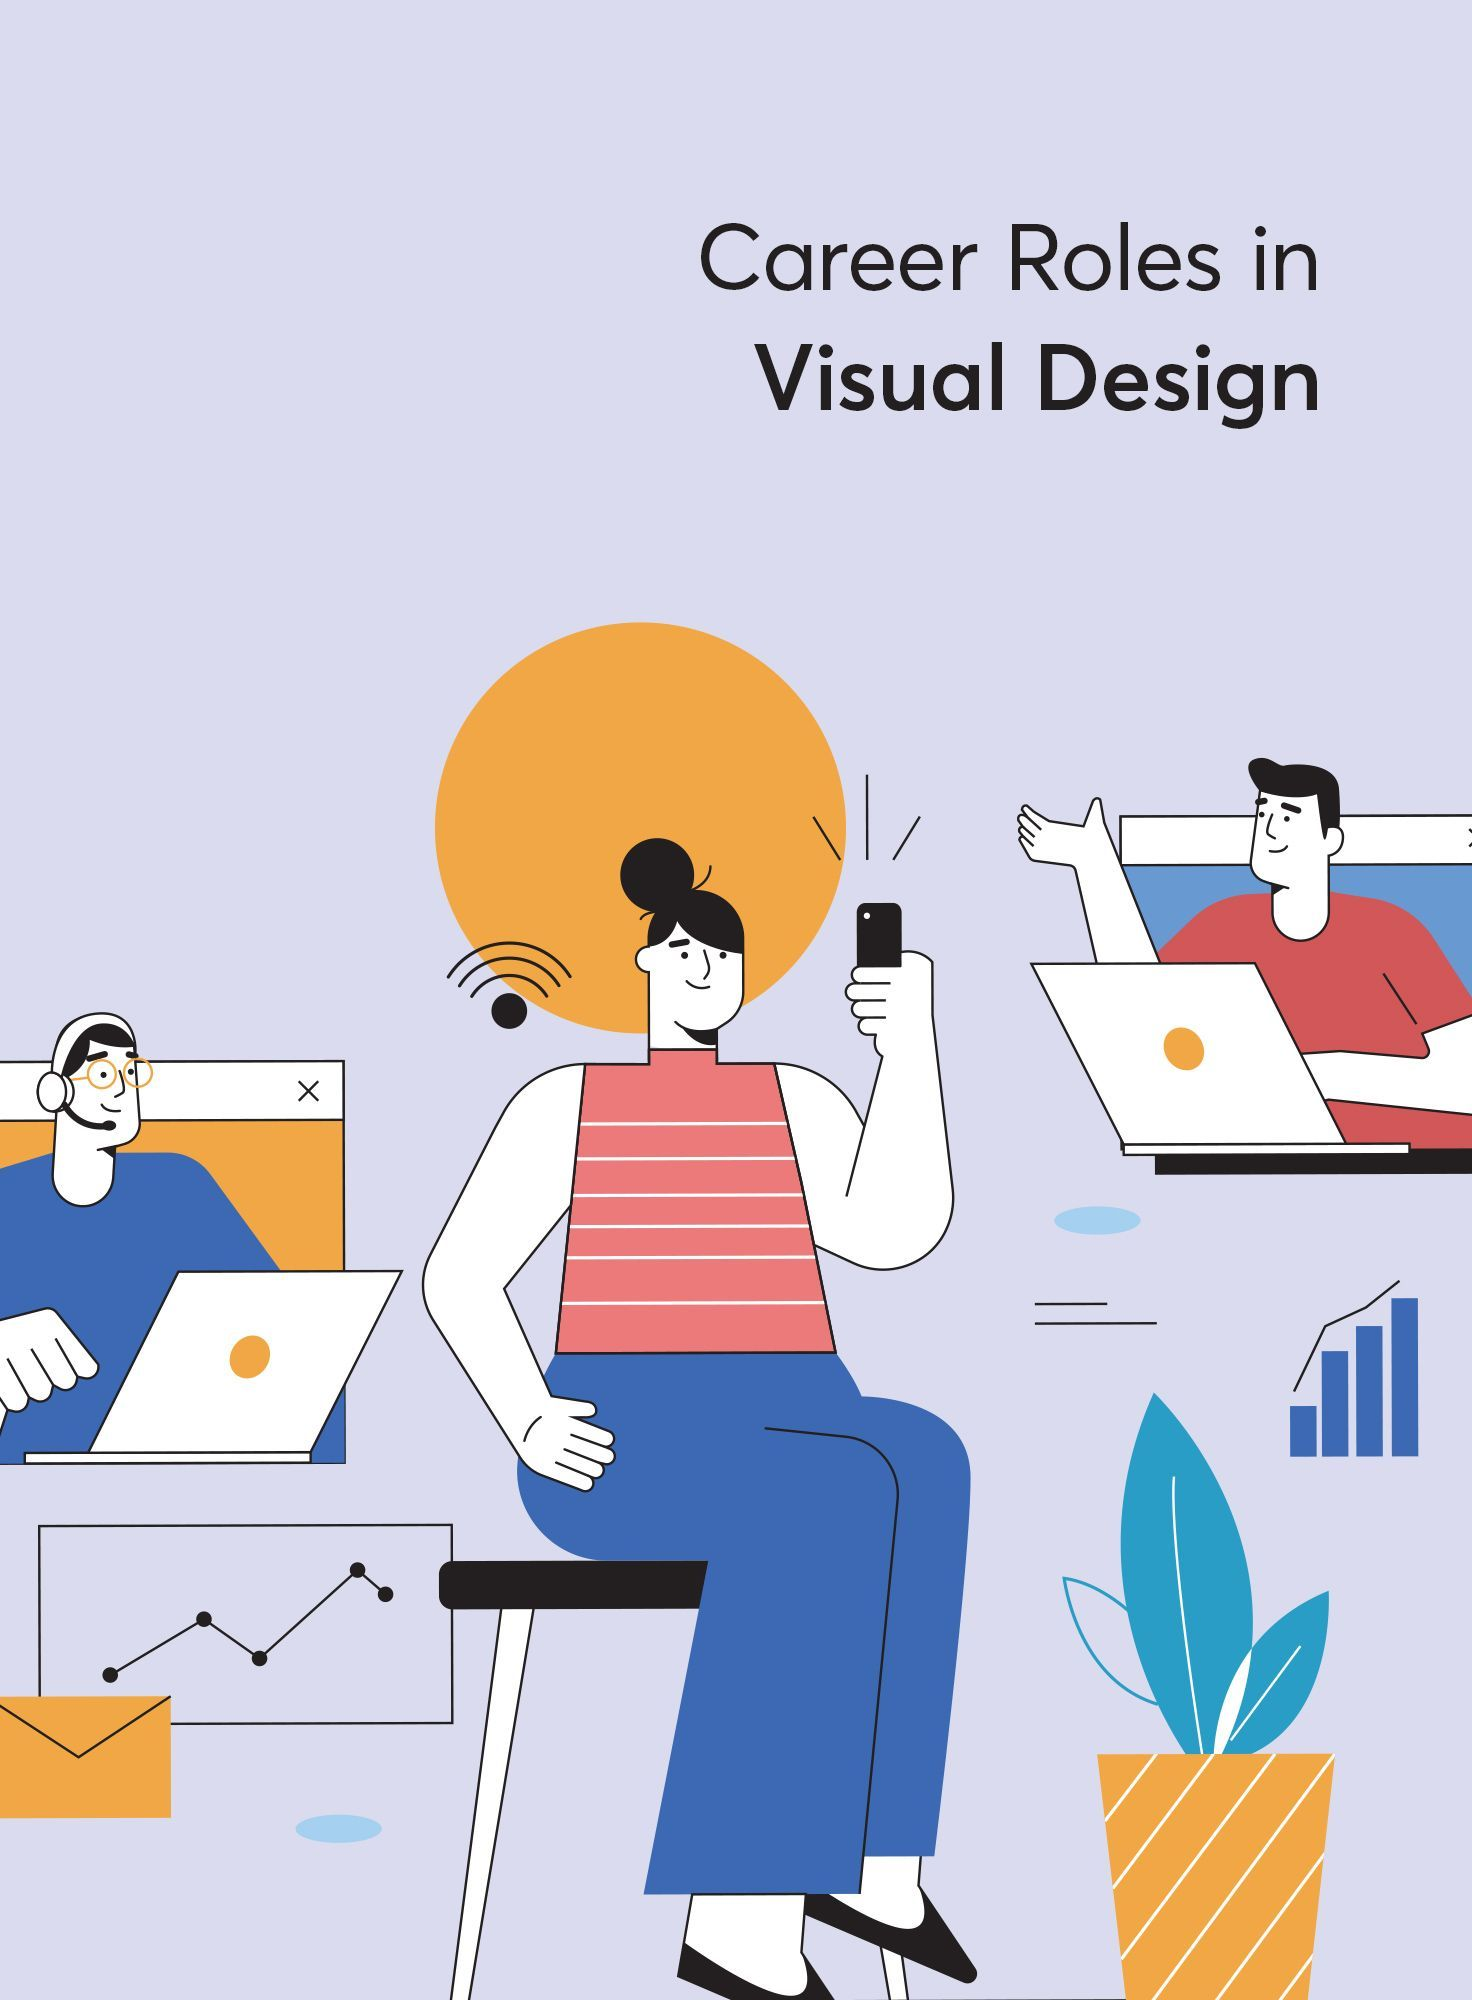 Three InDemand Career Roles to Explore in Visual Design